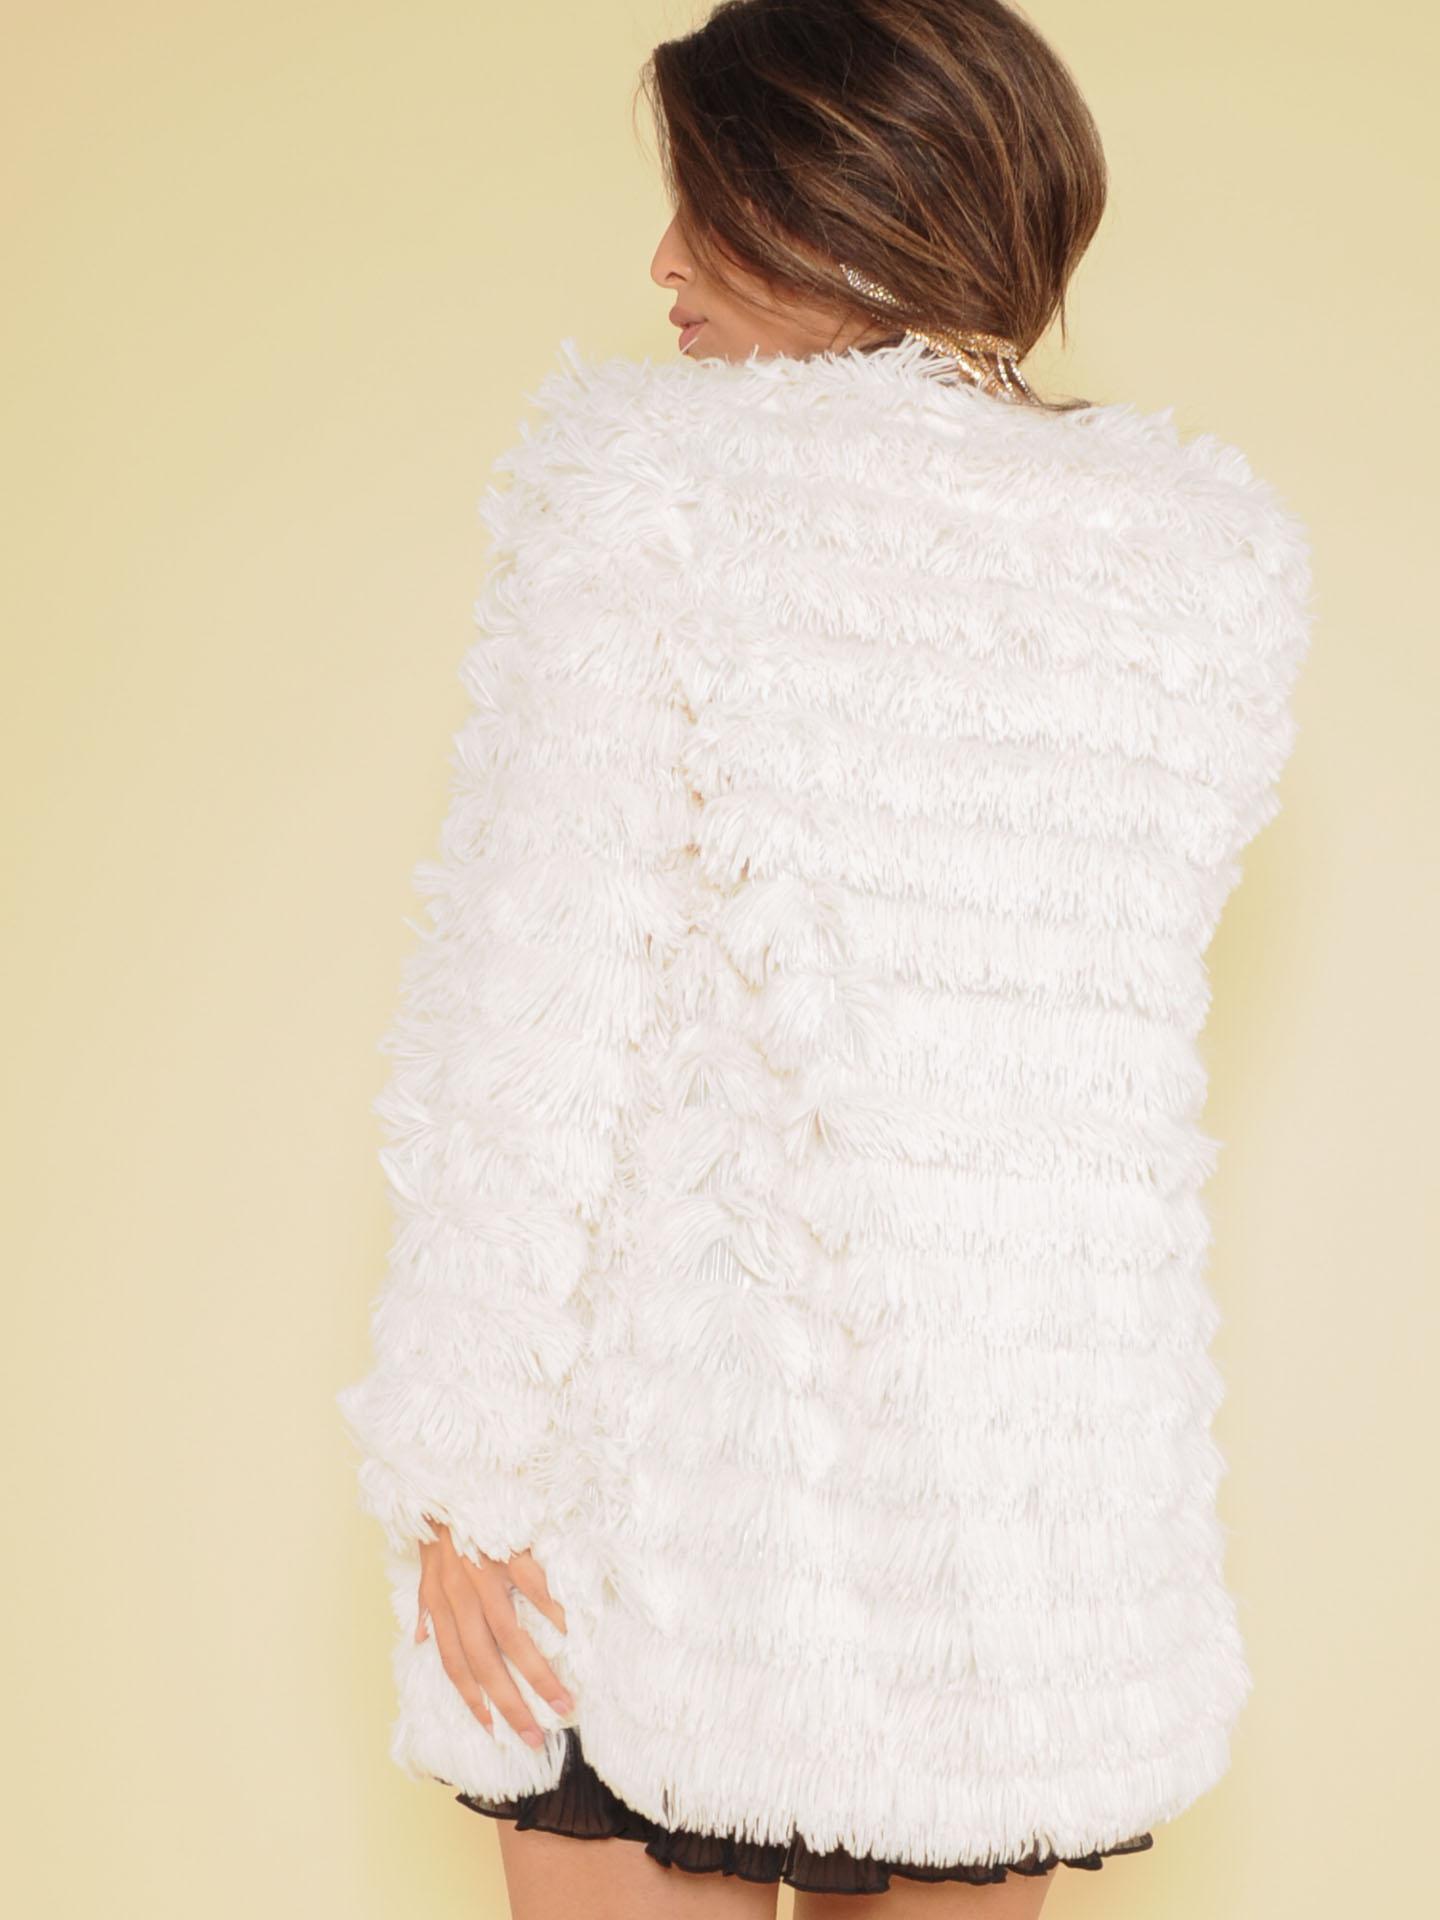 Myla Jacket Soft Cream Tassel Layer Back